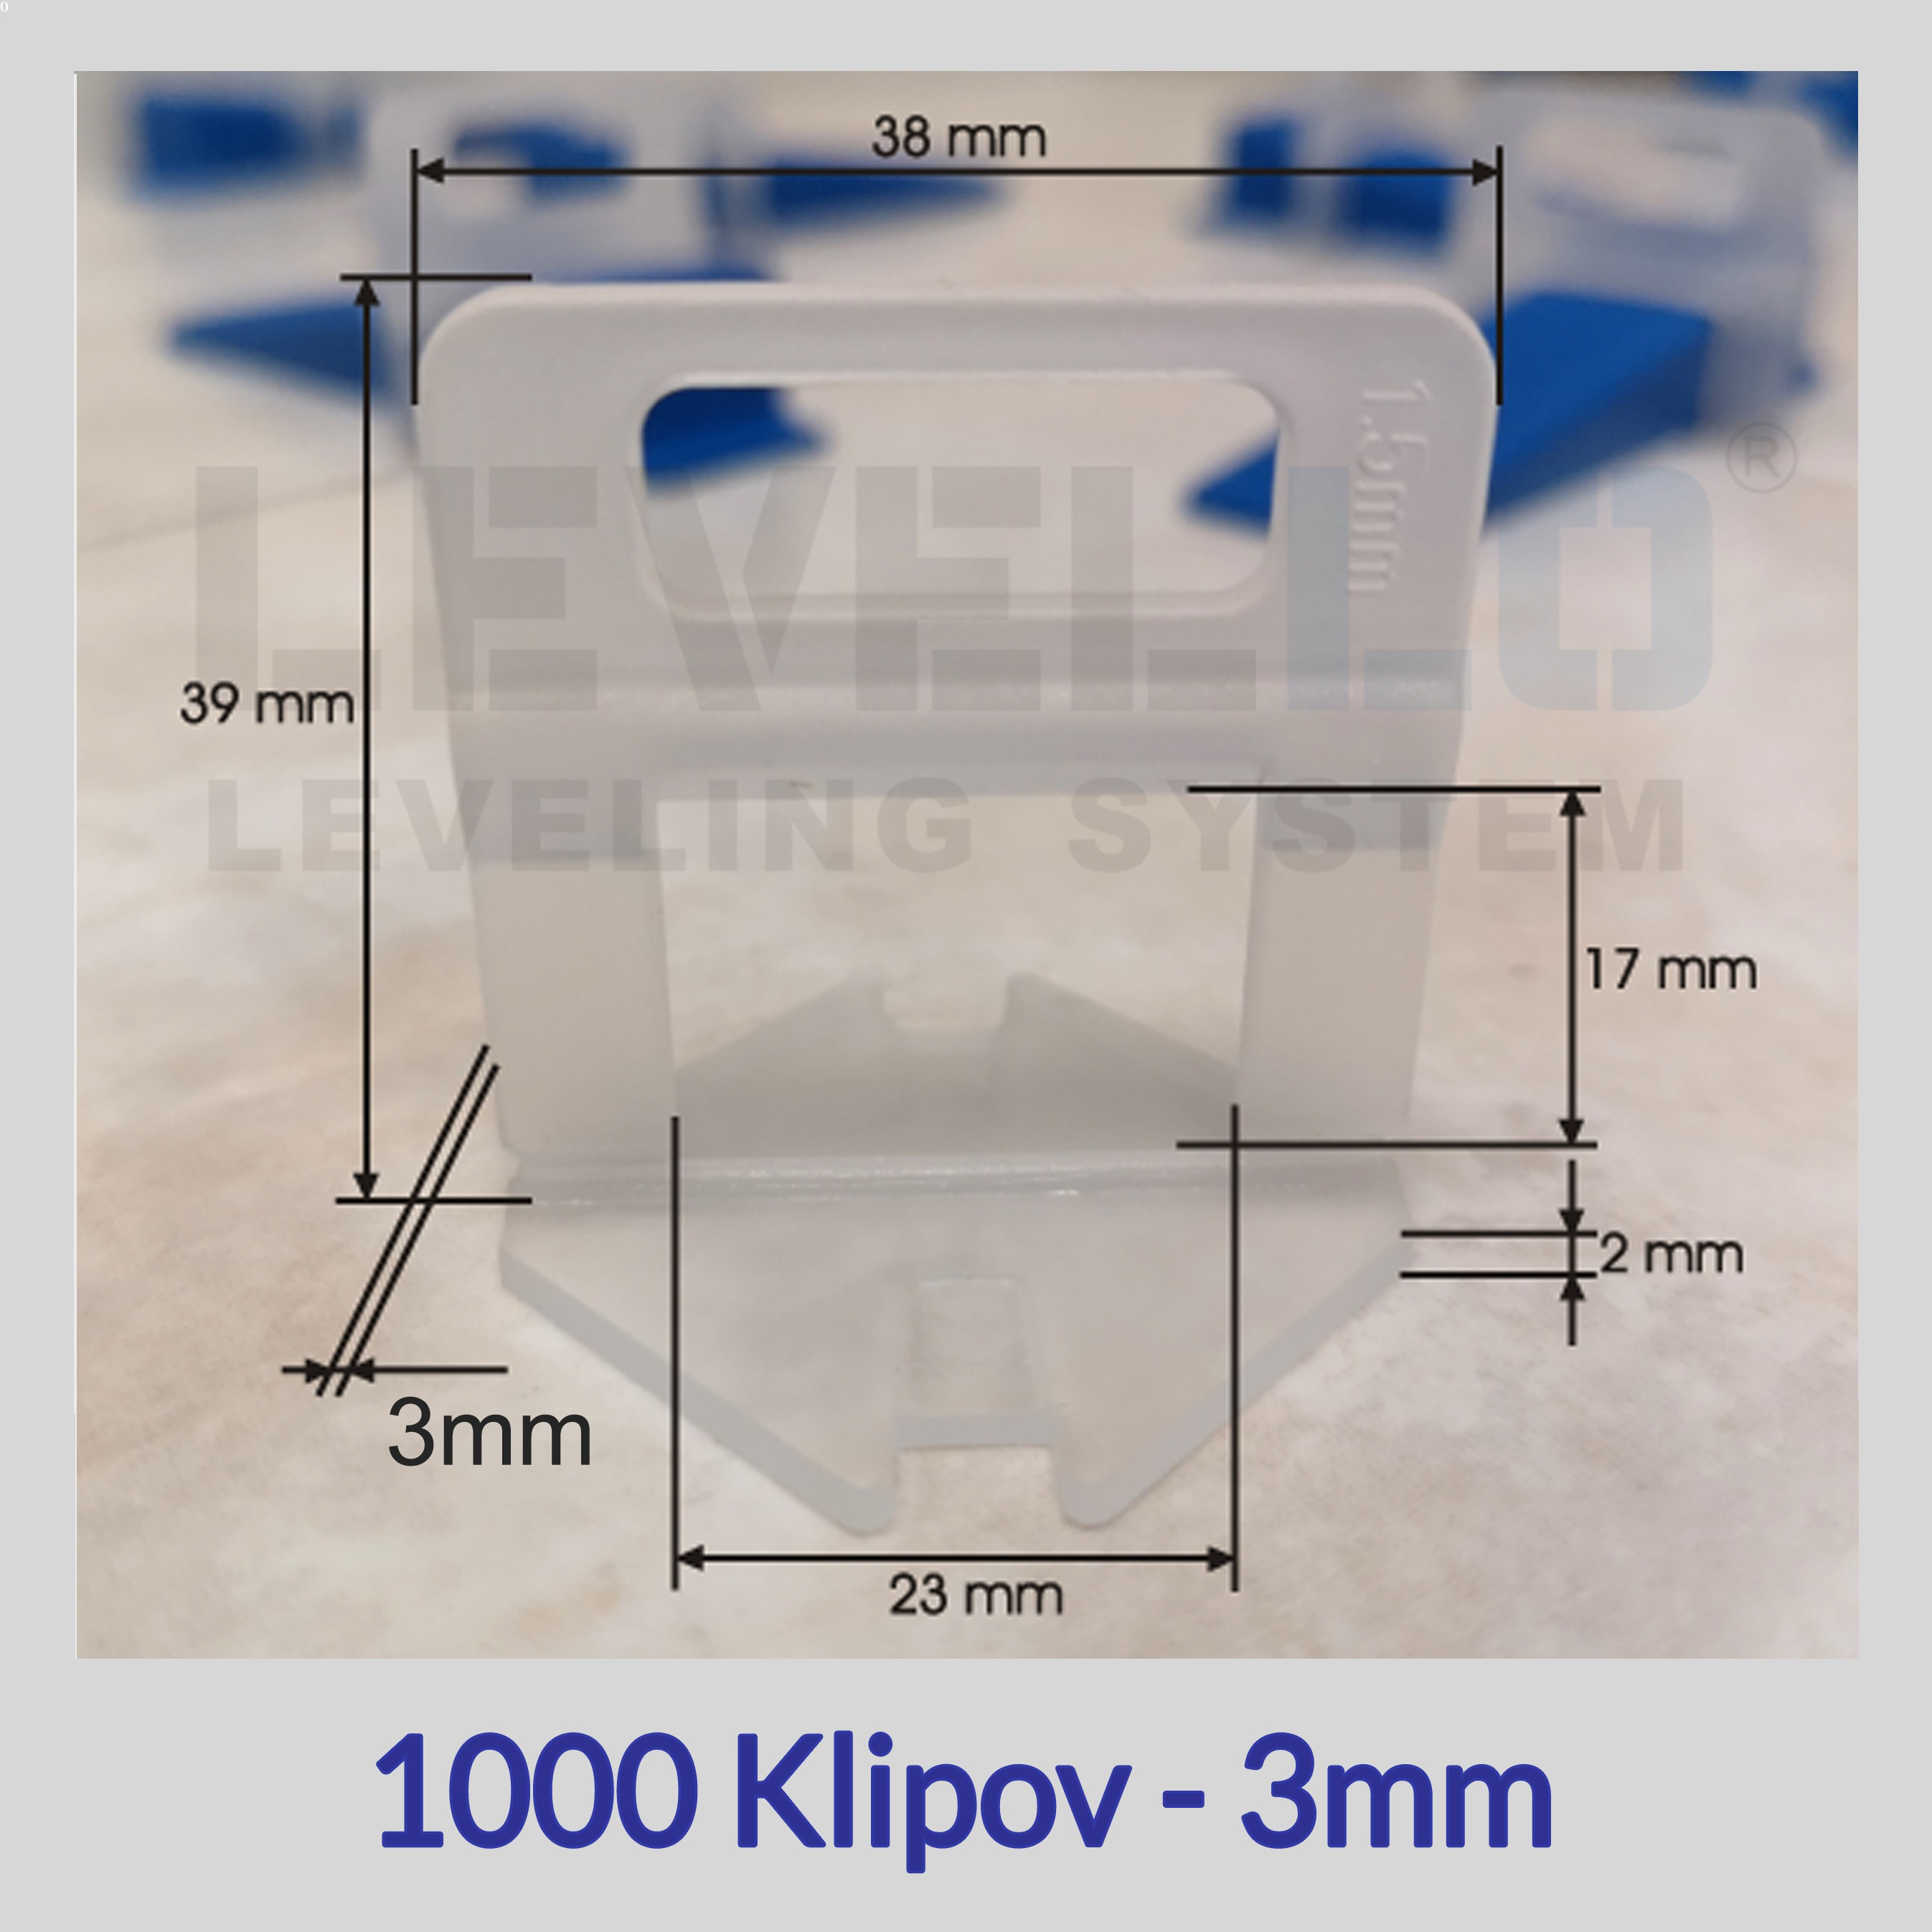 Klipy Eko LEVELLO ® 3 mm, 1000 kusov